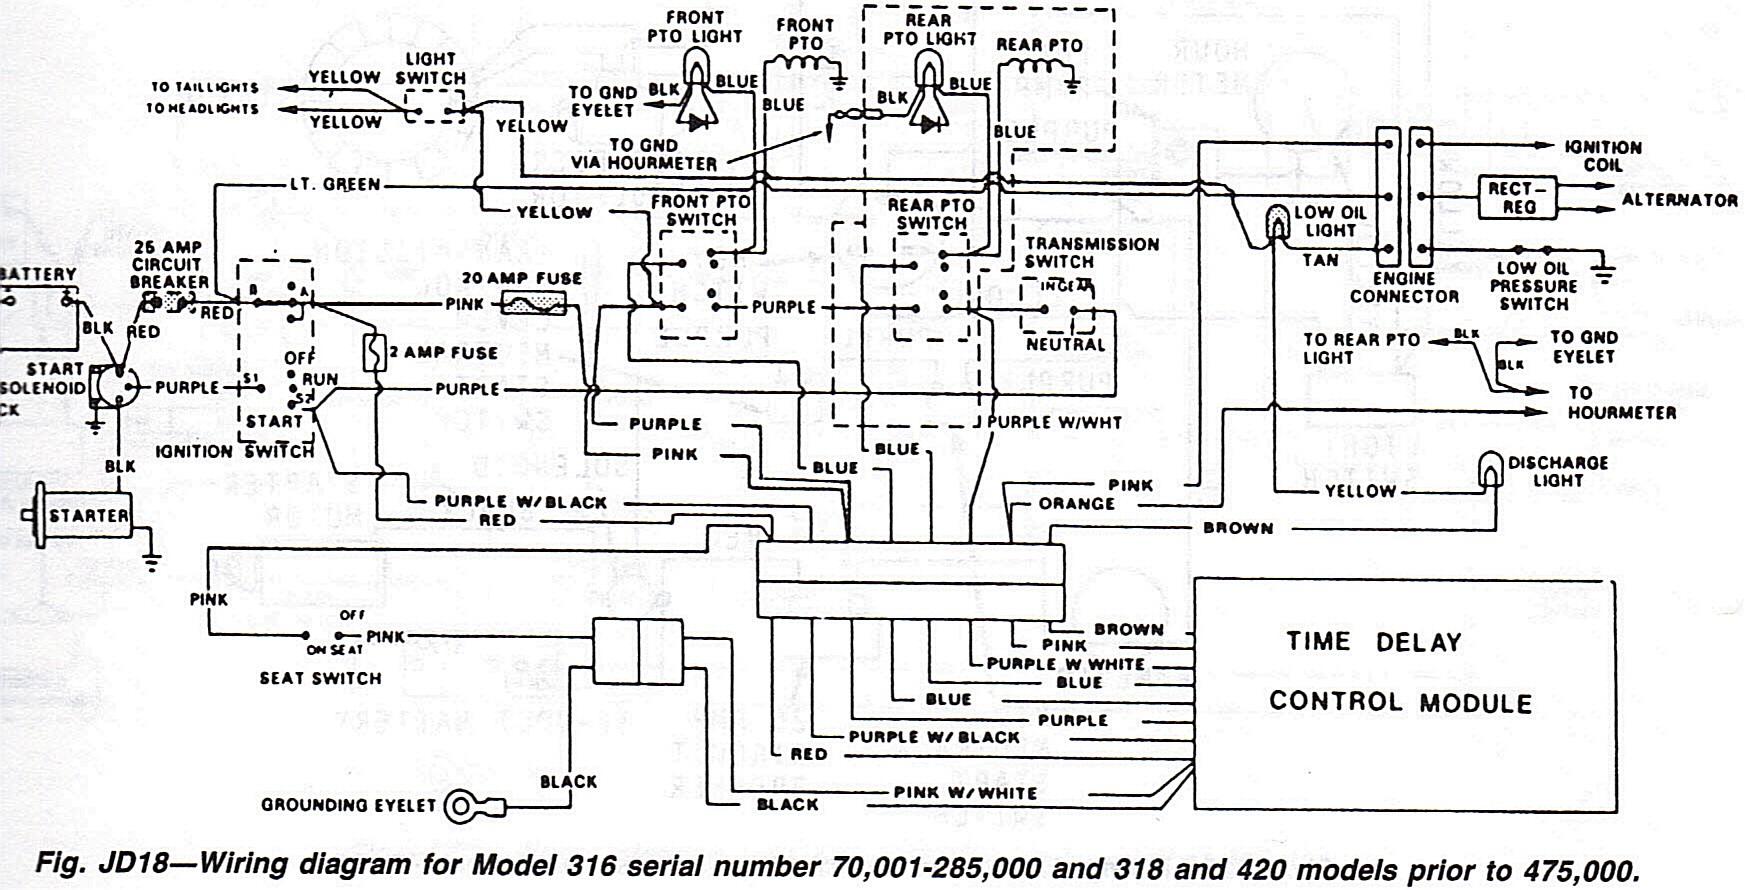 sabre wiring diagram john deere sabre wiring diagram wiring diagram